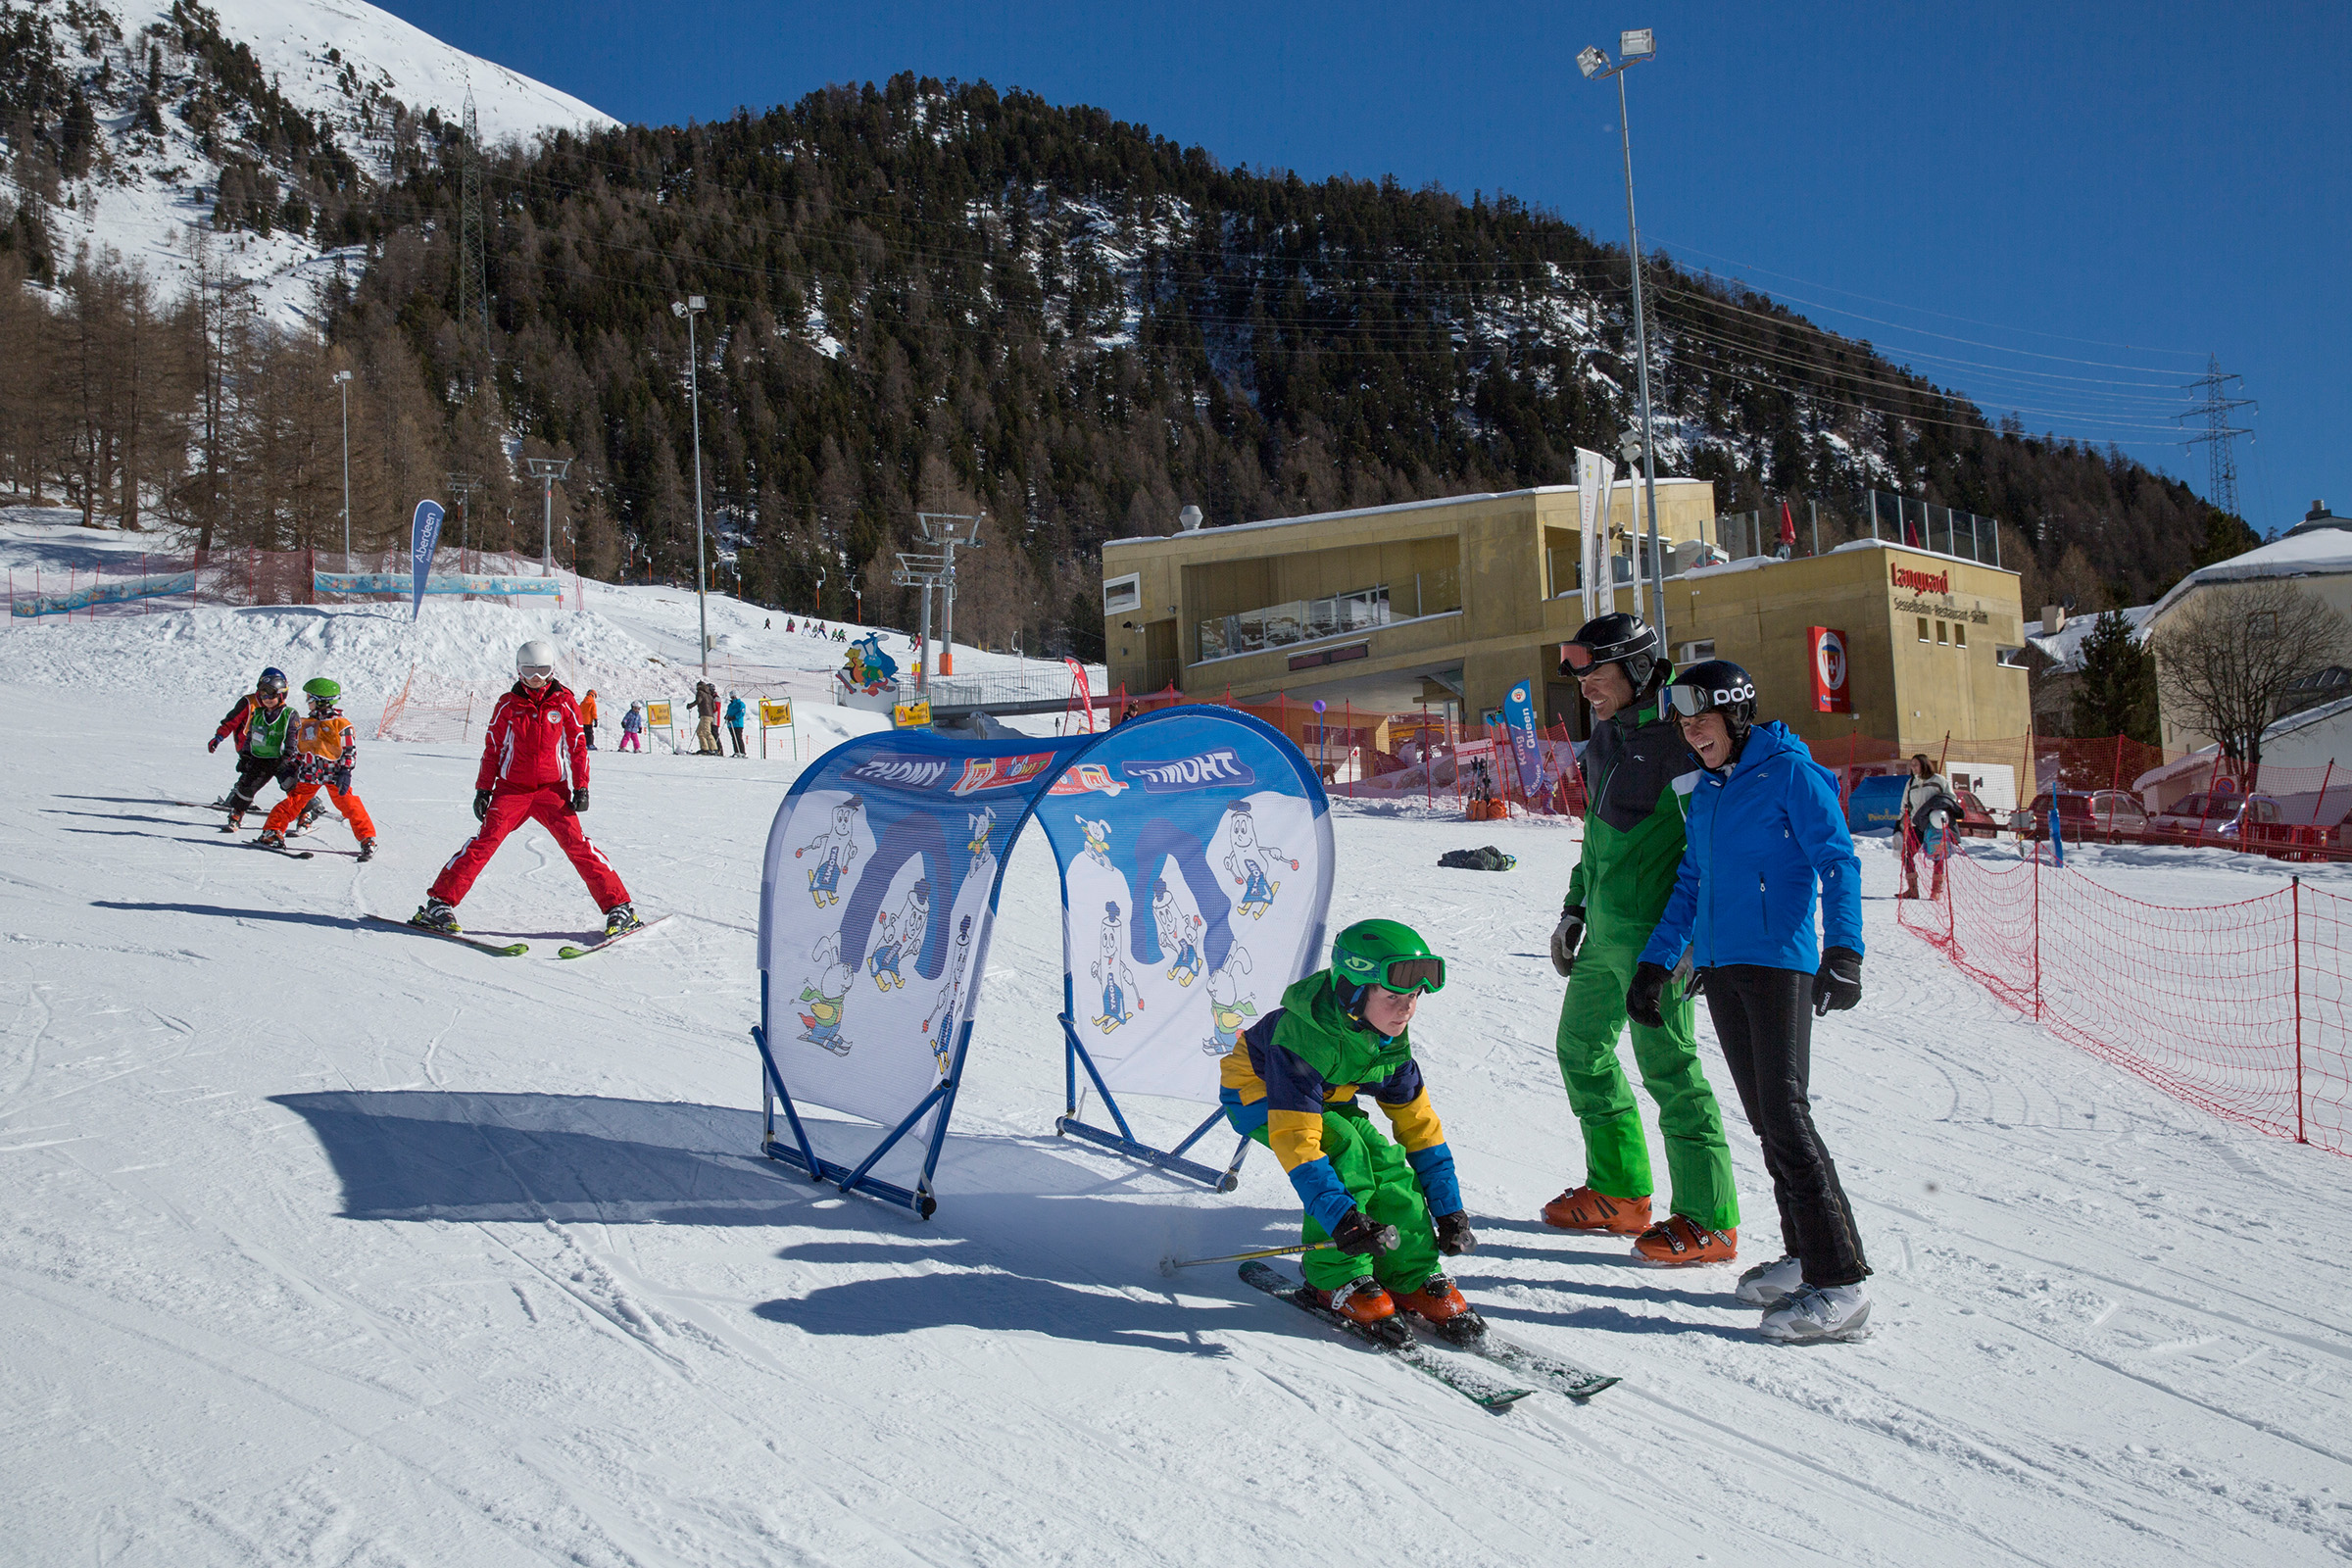 Familien-Skigebiet Languard, Pontresina